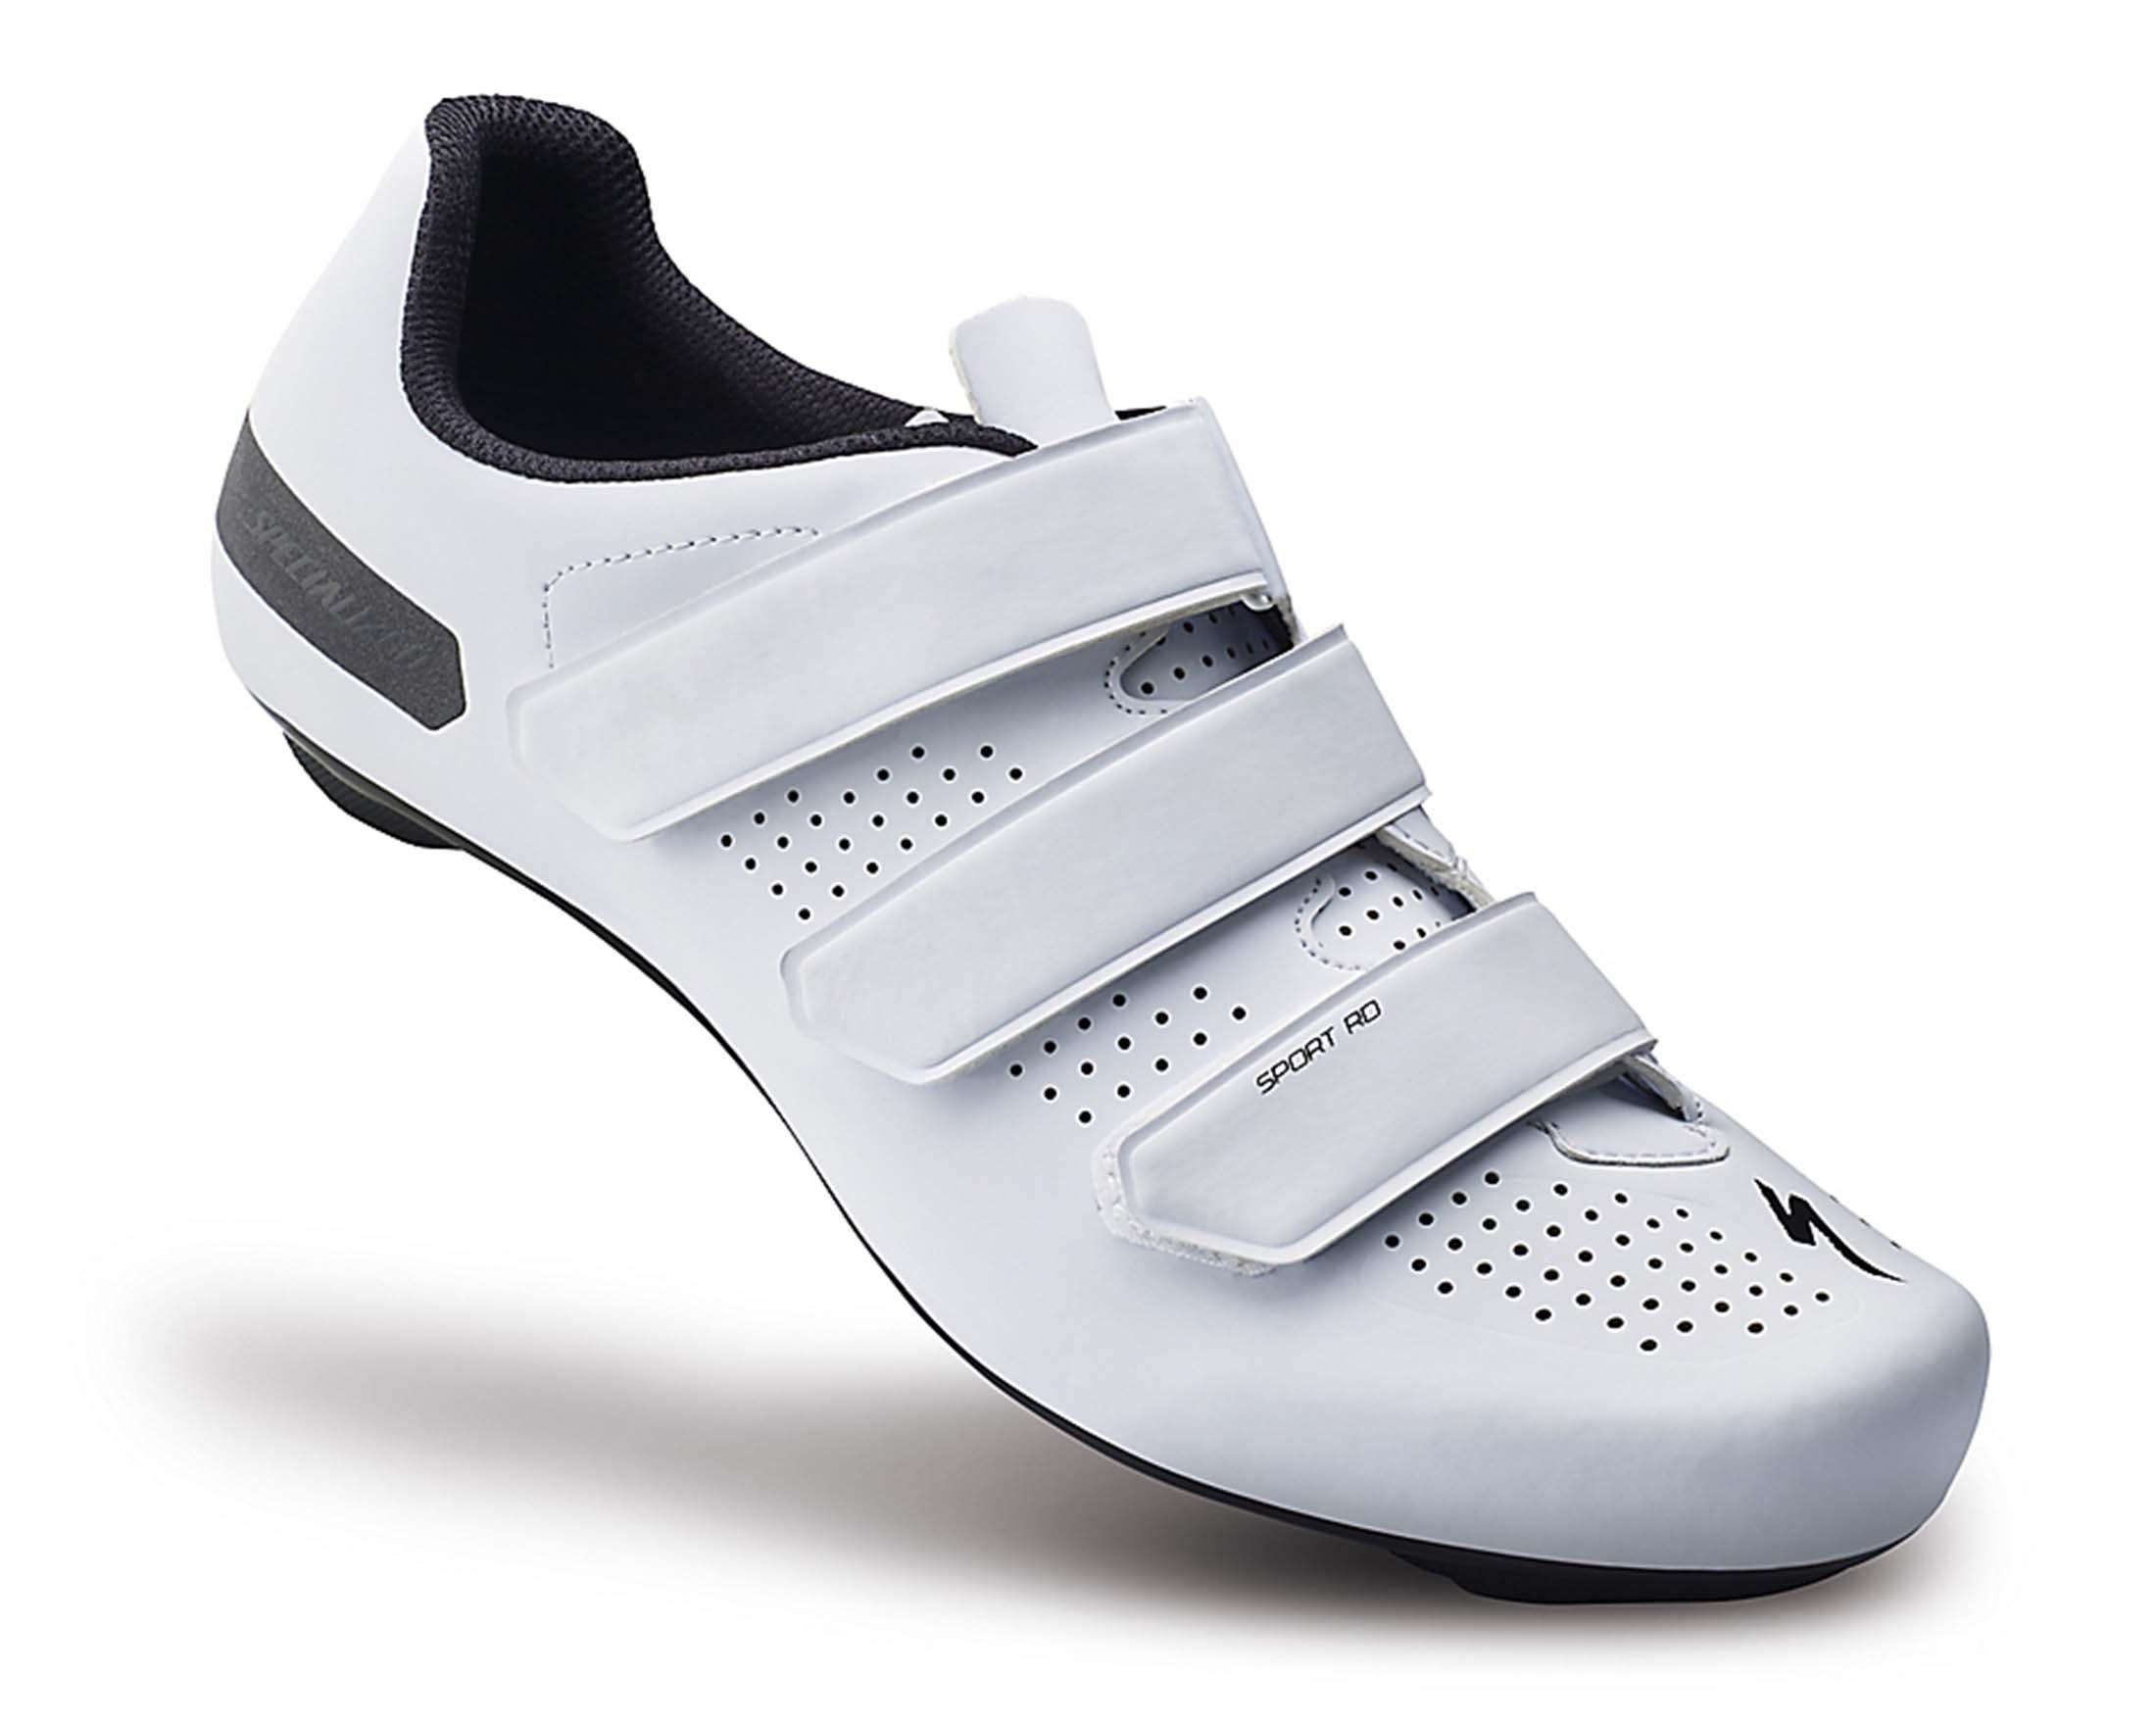 Specialized Specialized Schuhe Schuhe Schuhe Specialized RennradFahrradhandschuhe RennradFahrradhandschuhe Specialized RennradFahrradhandschuhe Specialized RennradFahrradhandschuhe Schuhe vnwmNO80